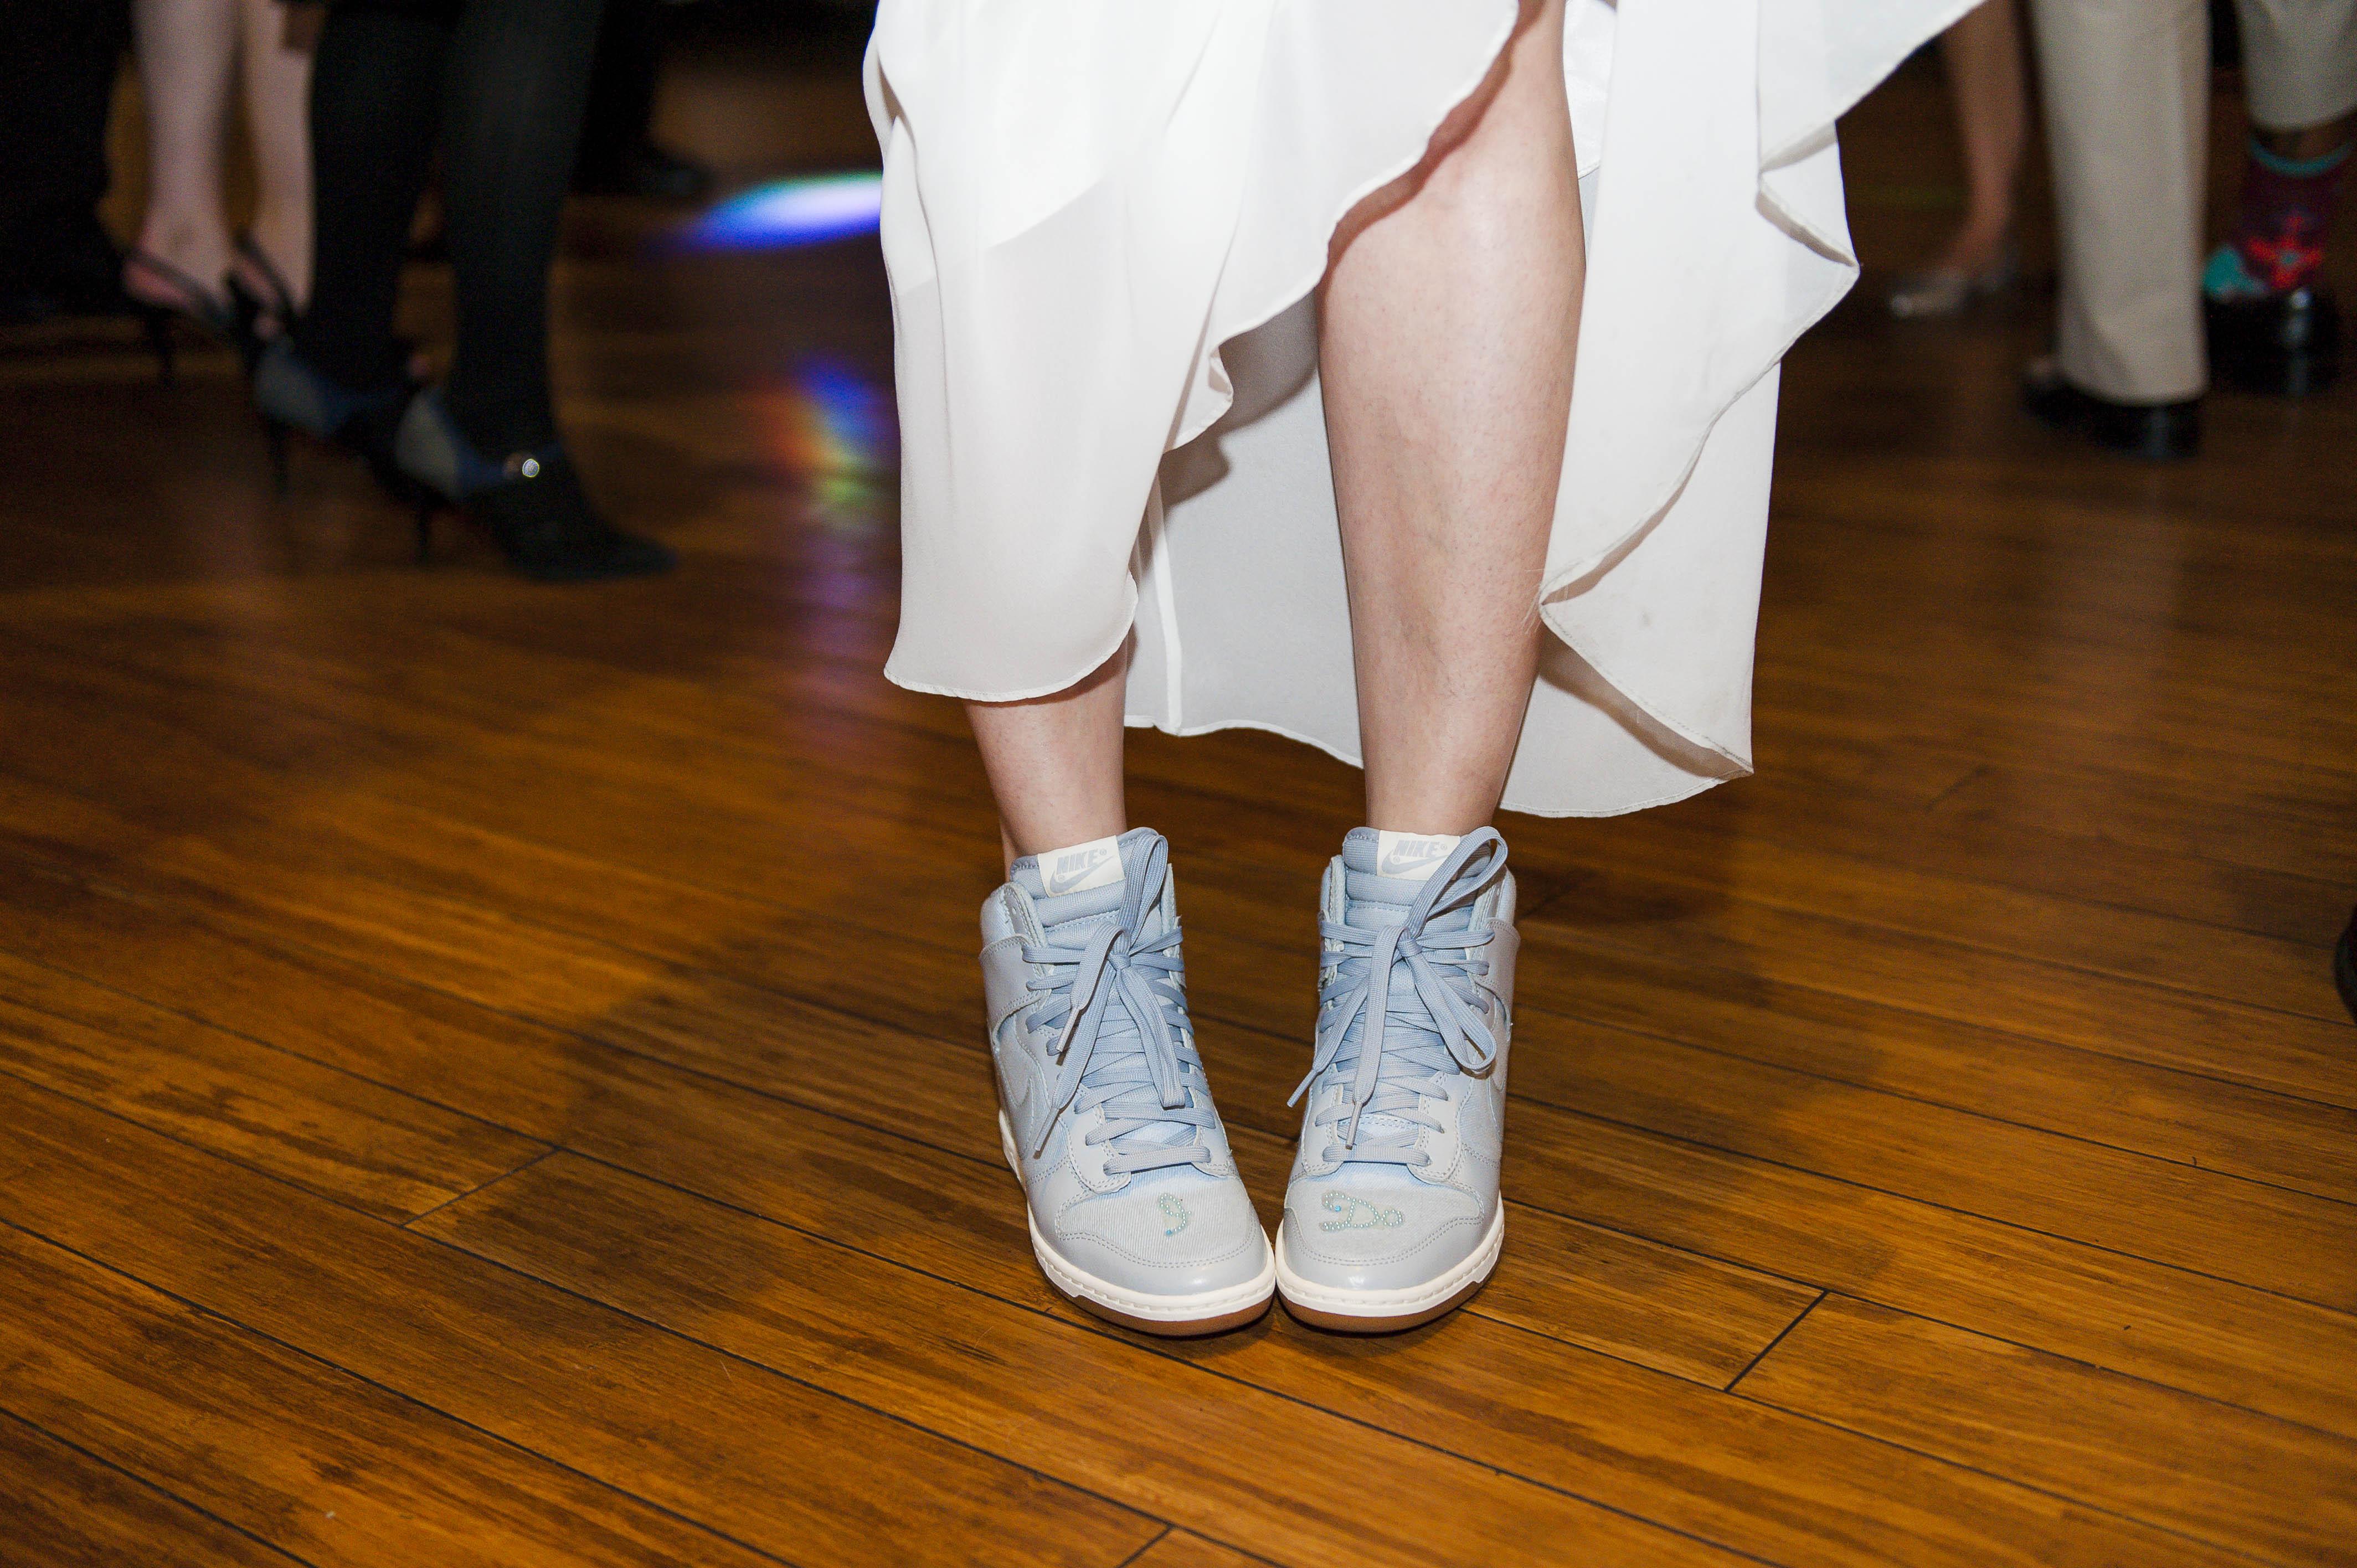 Details – Comfortable Shoes – Running Shoes – Nike – Fall Wedding – Reception  – Horah – Jewish Wedding – Offbeat Bride – St.Lawrence Market Wedding – Toronto Wedding Photographer